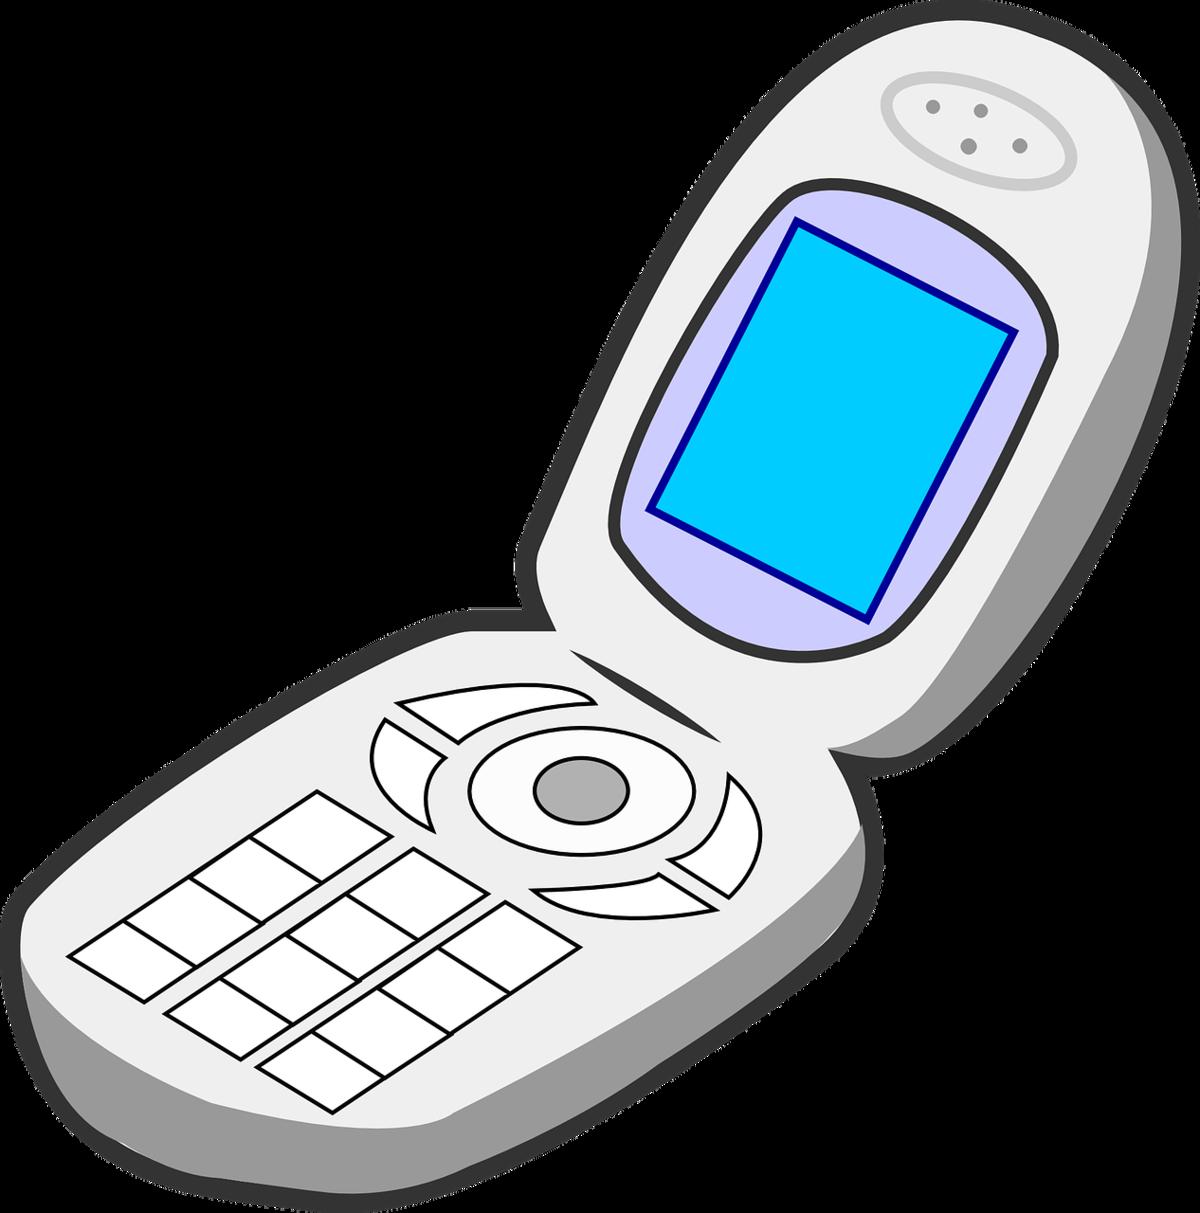 Телефон рисунок картинка